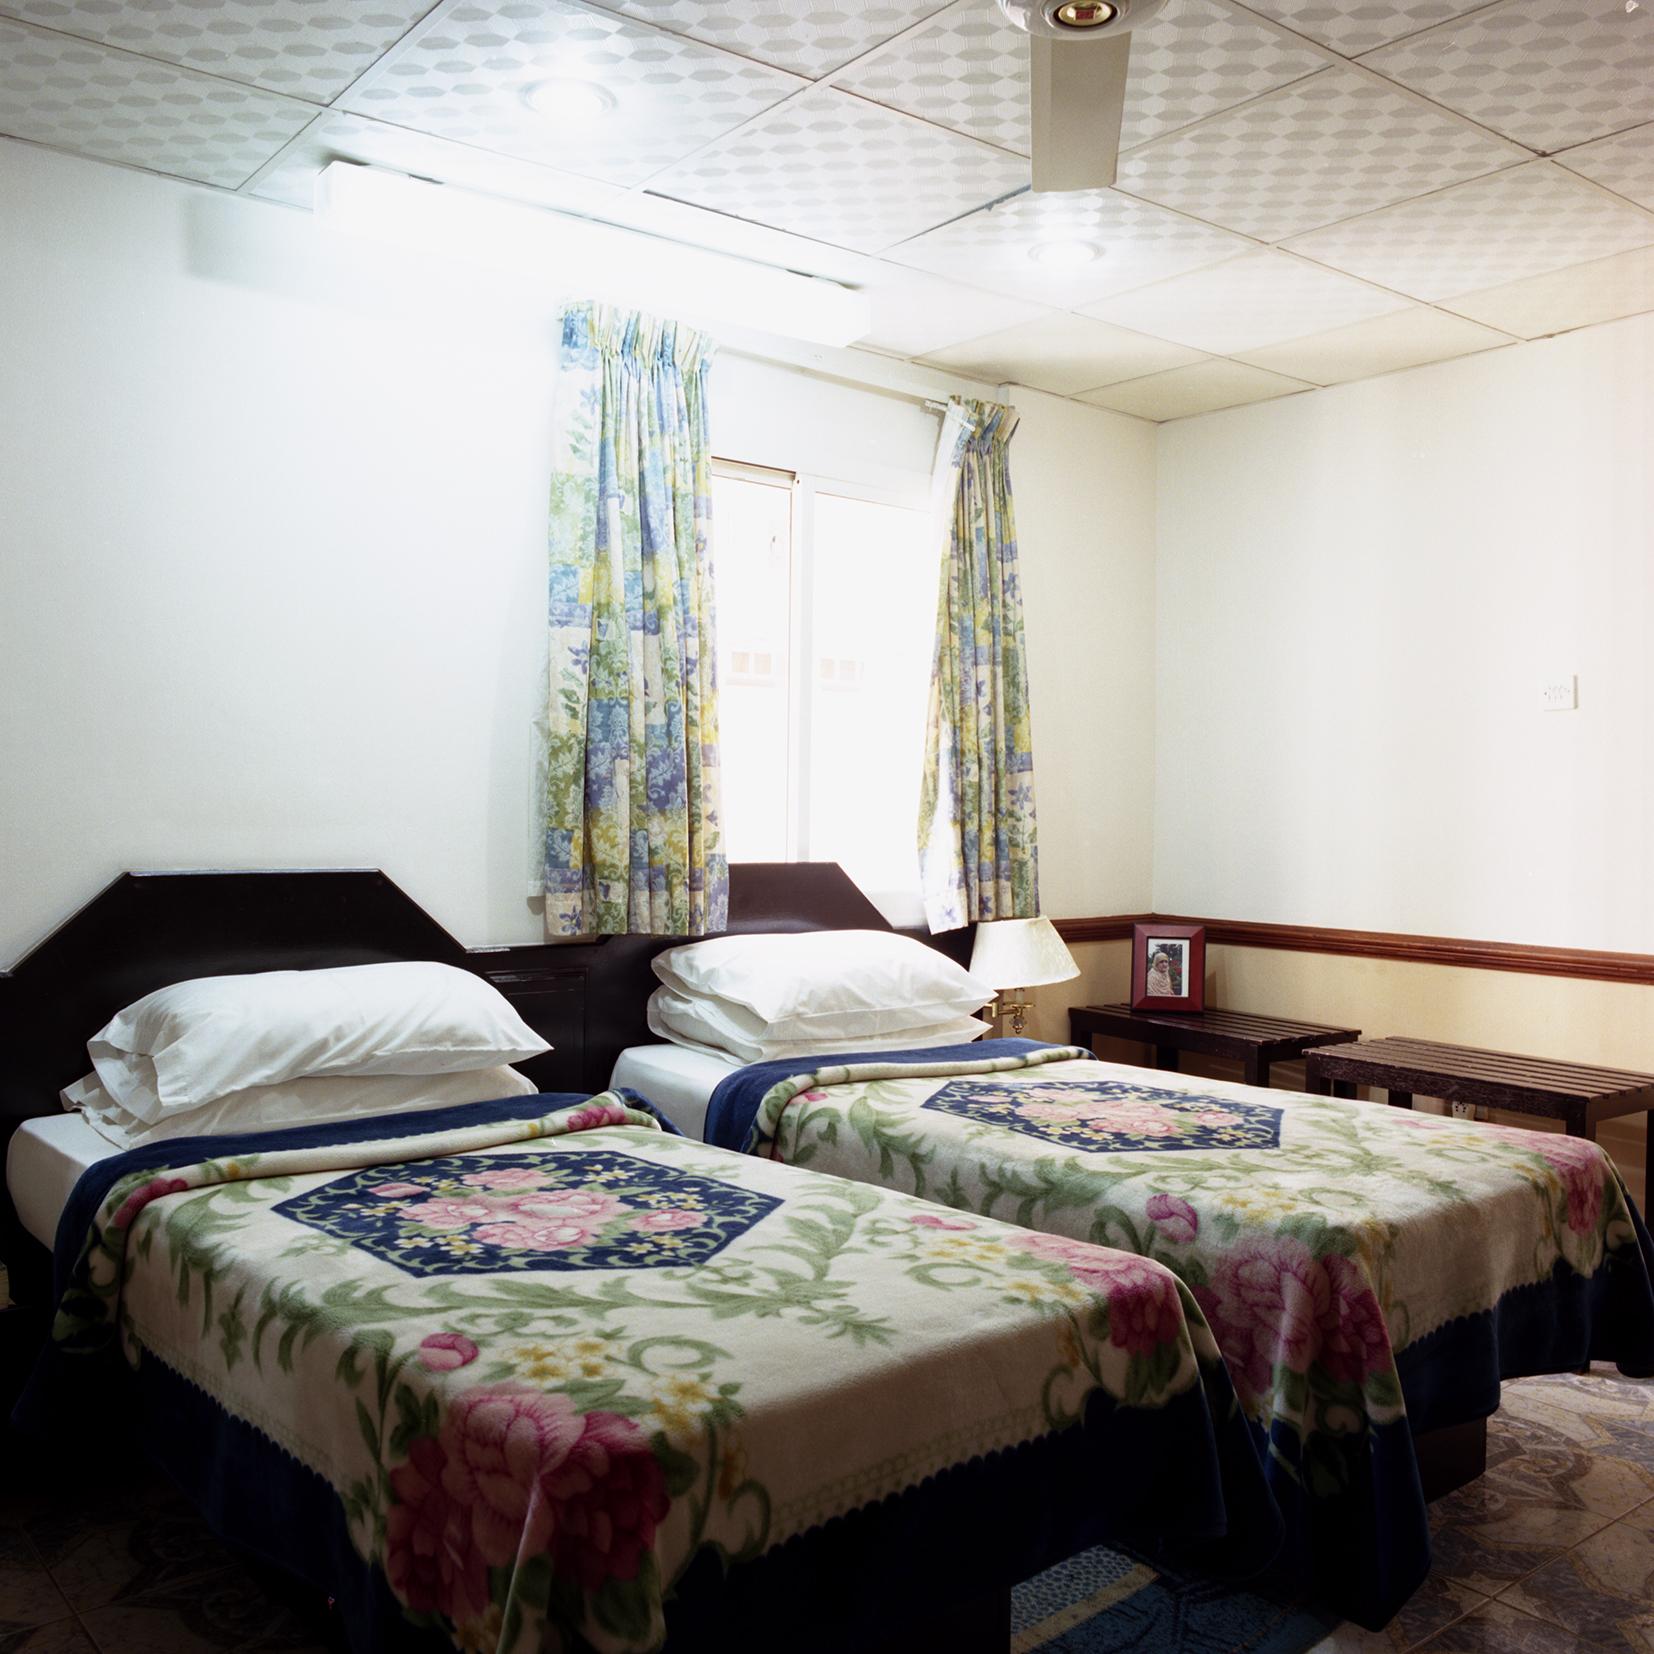 La Paz Hotel